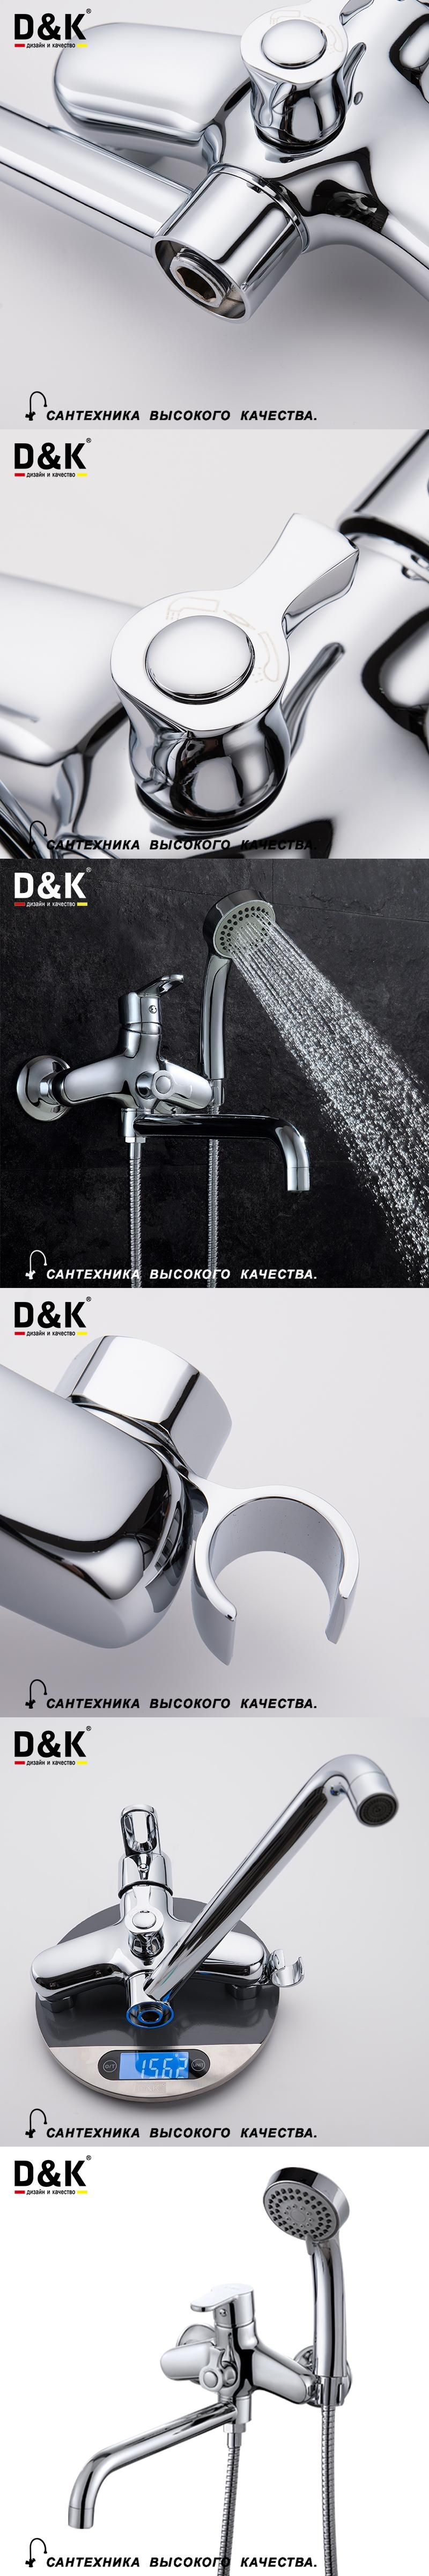 D&K DA1393301 High Quality Bathtub Faucet with Hand Shower Chrome ...